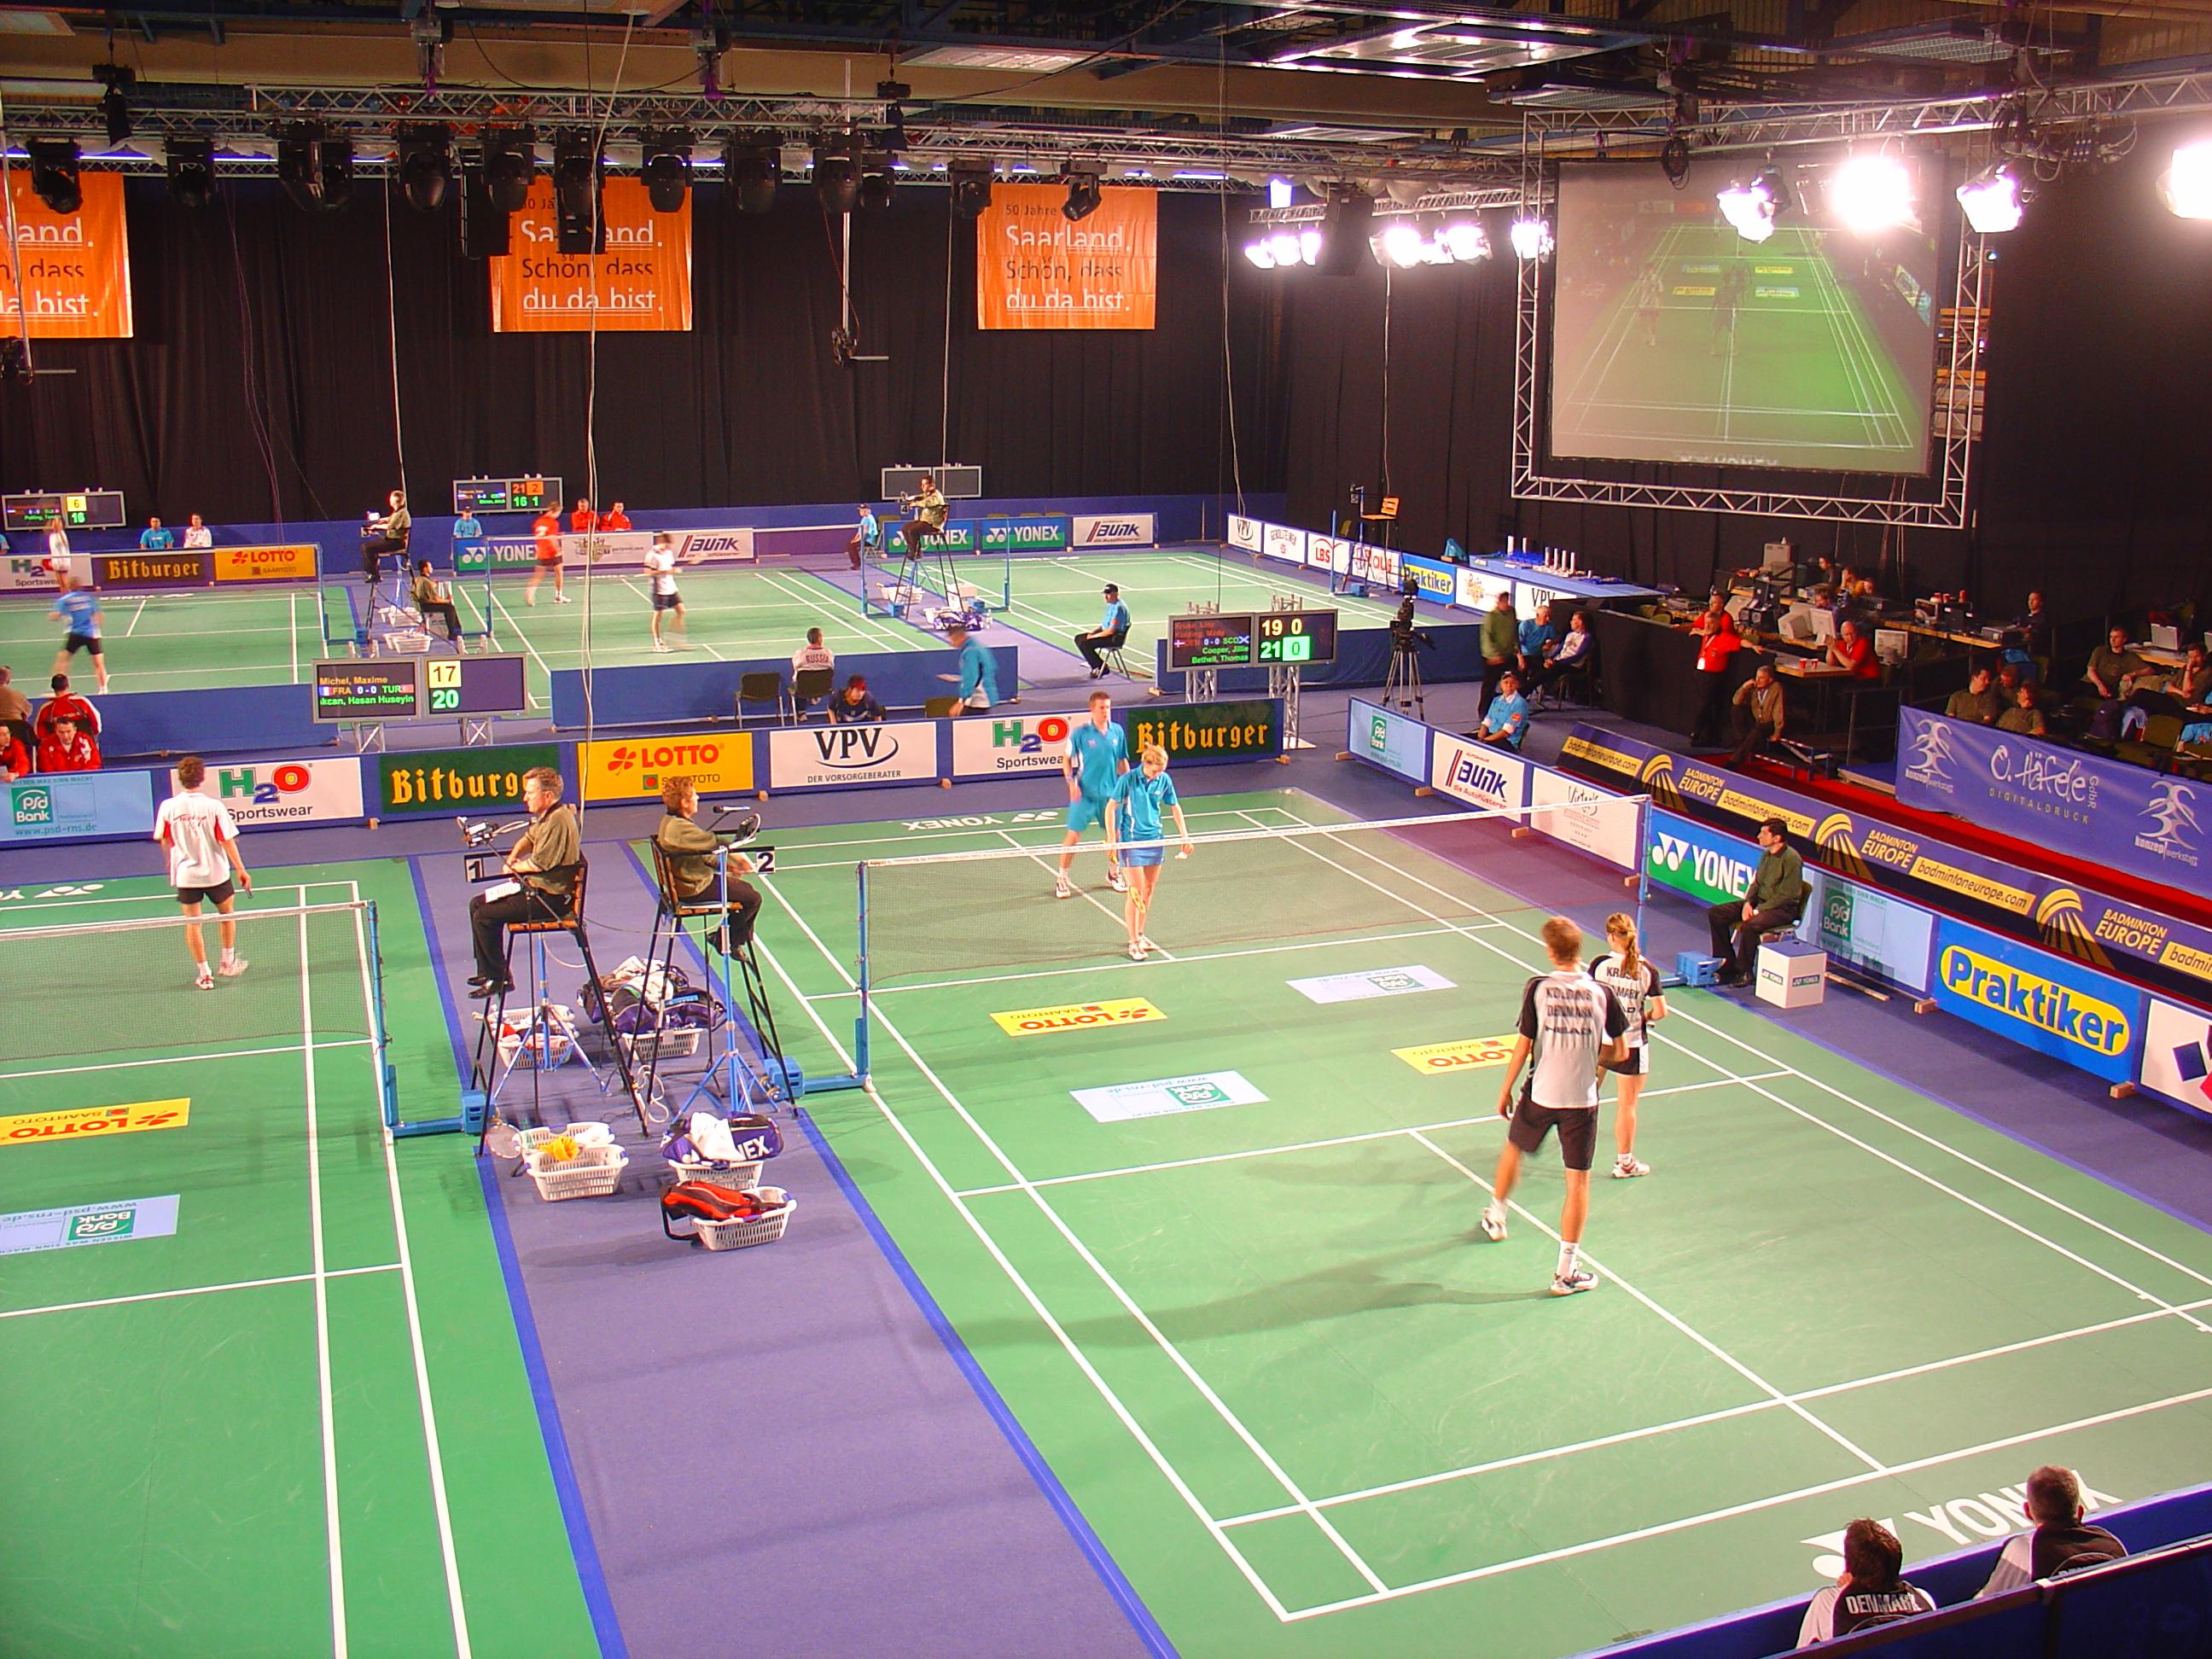 Badminton Junioreneuropameisterschaft Wikiwand